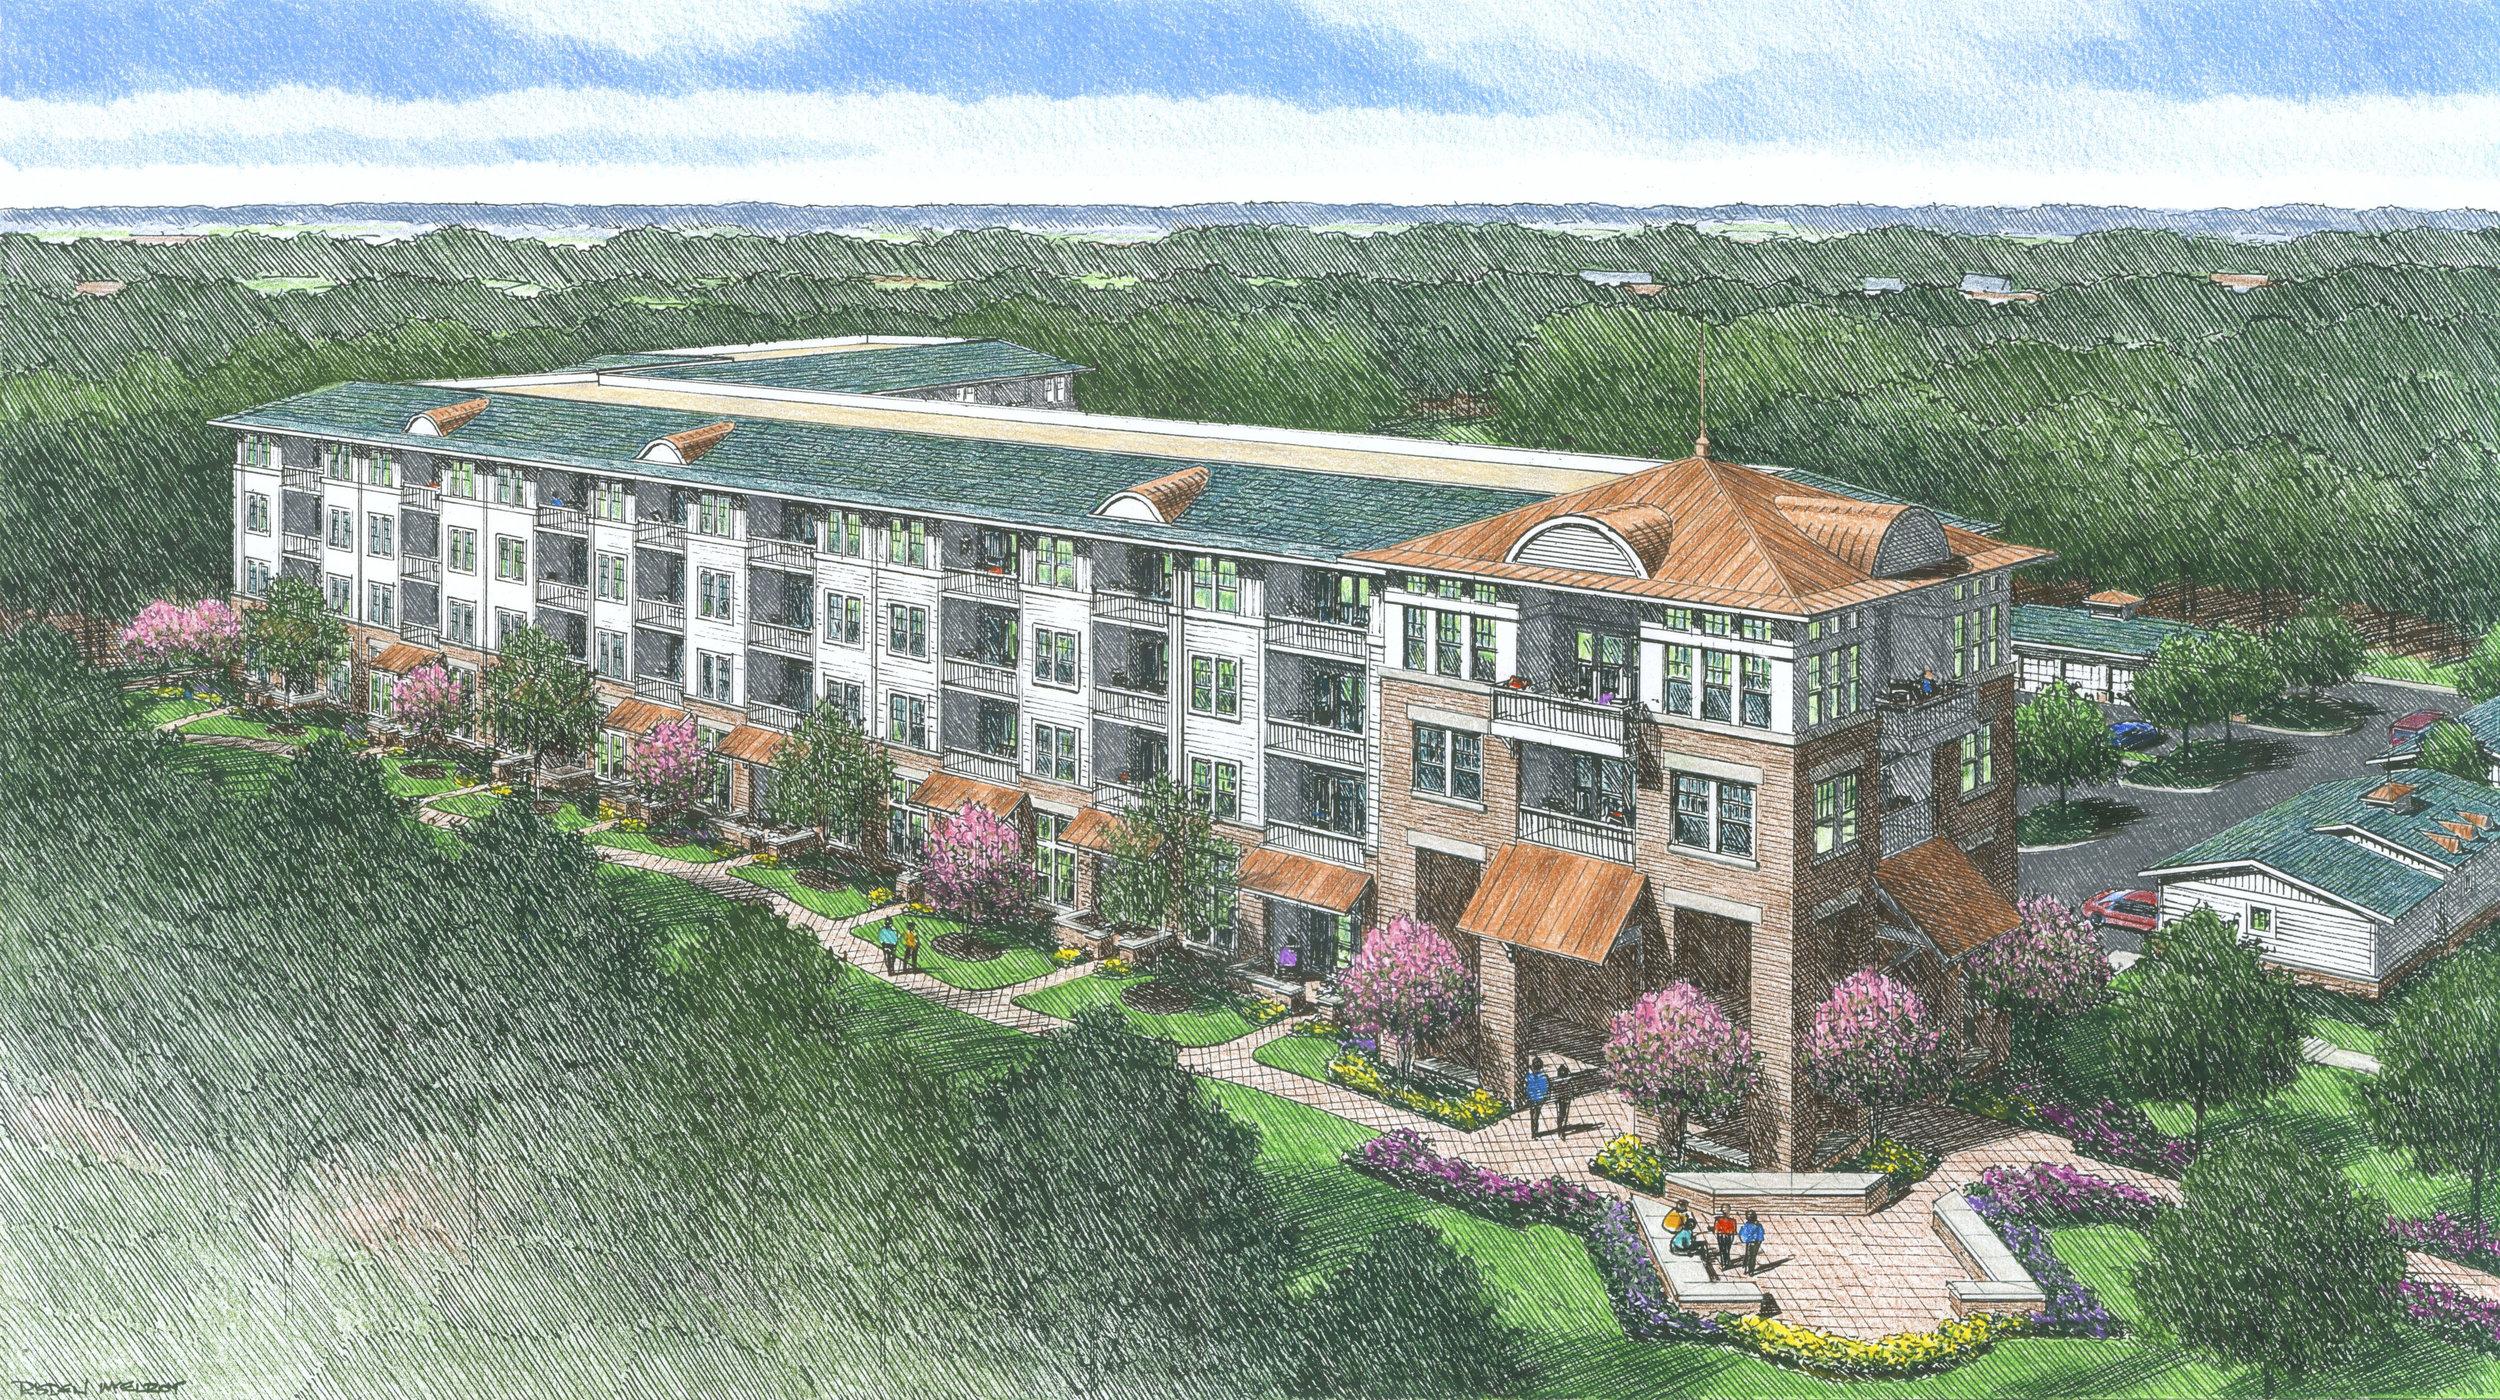 apartments-thegreens-pinehurst-fmk-architects